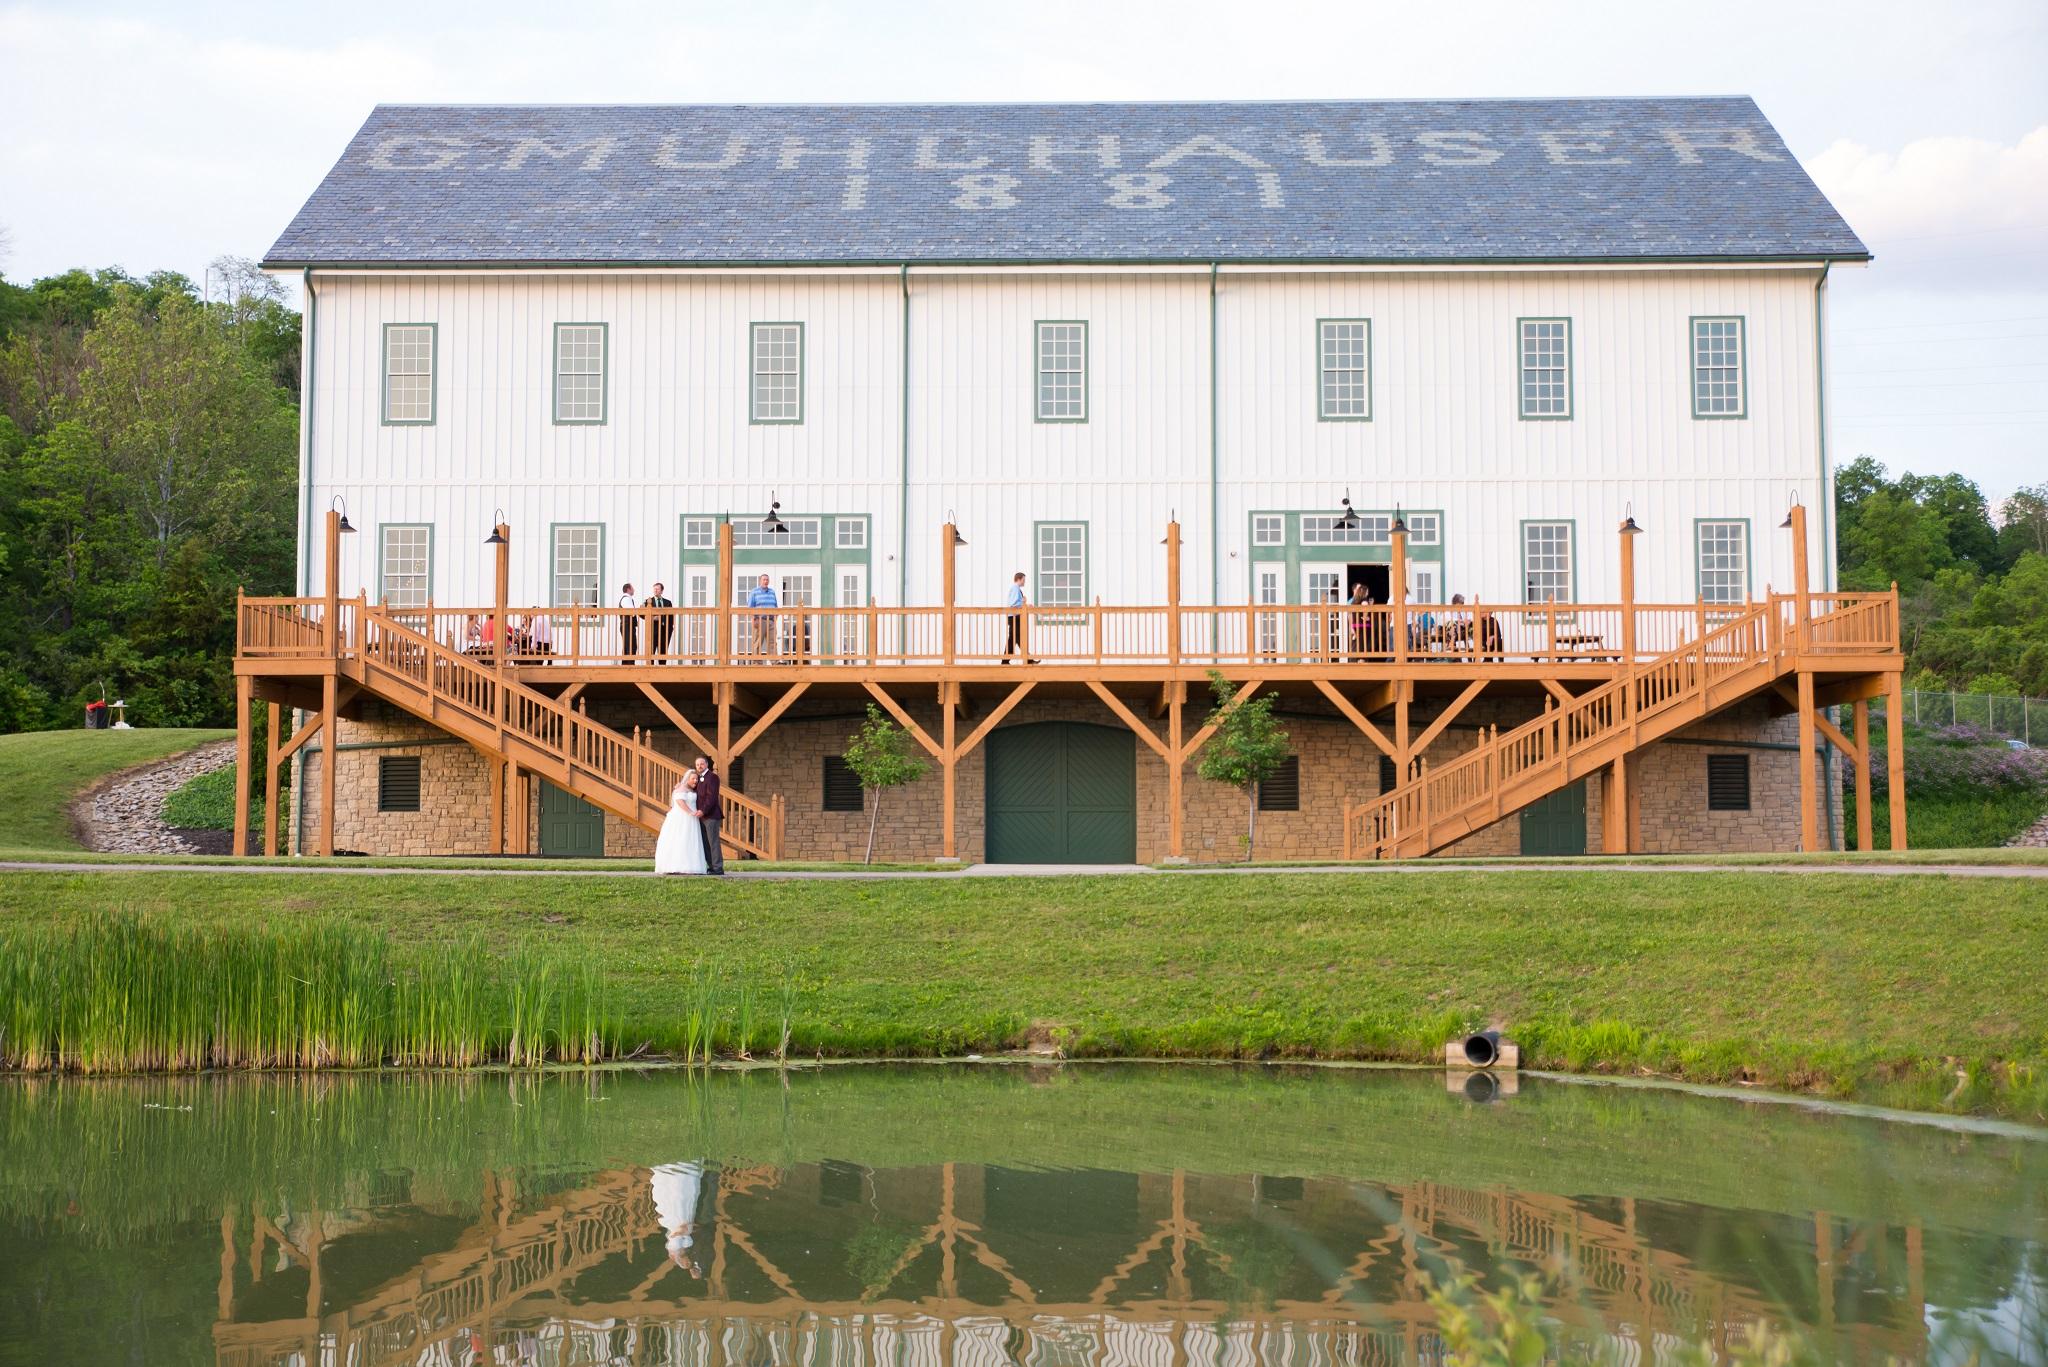 Mulhuaser wedding barn in West Chester, Ohio